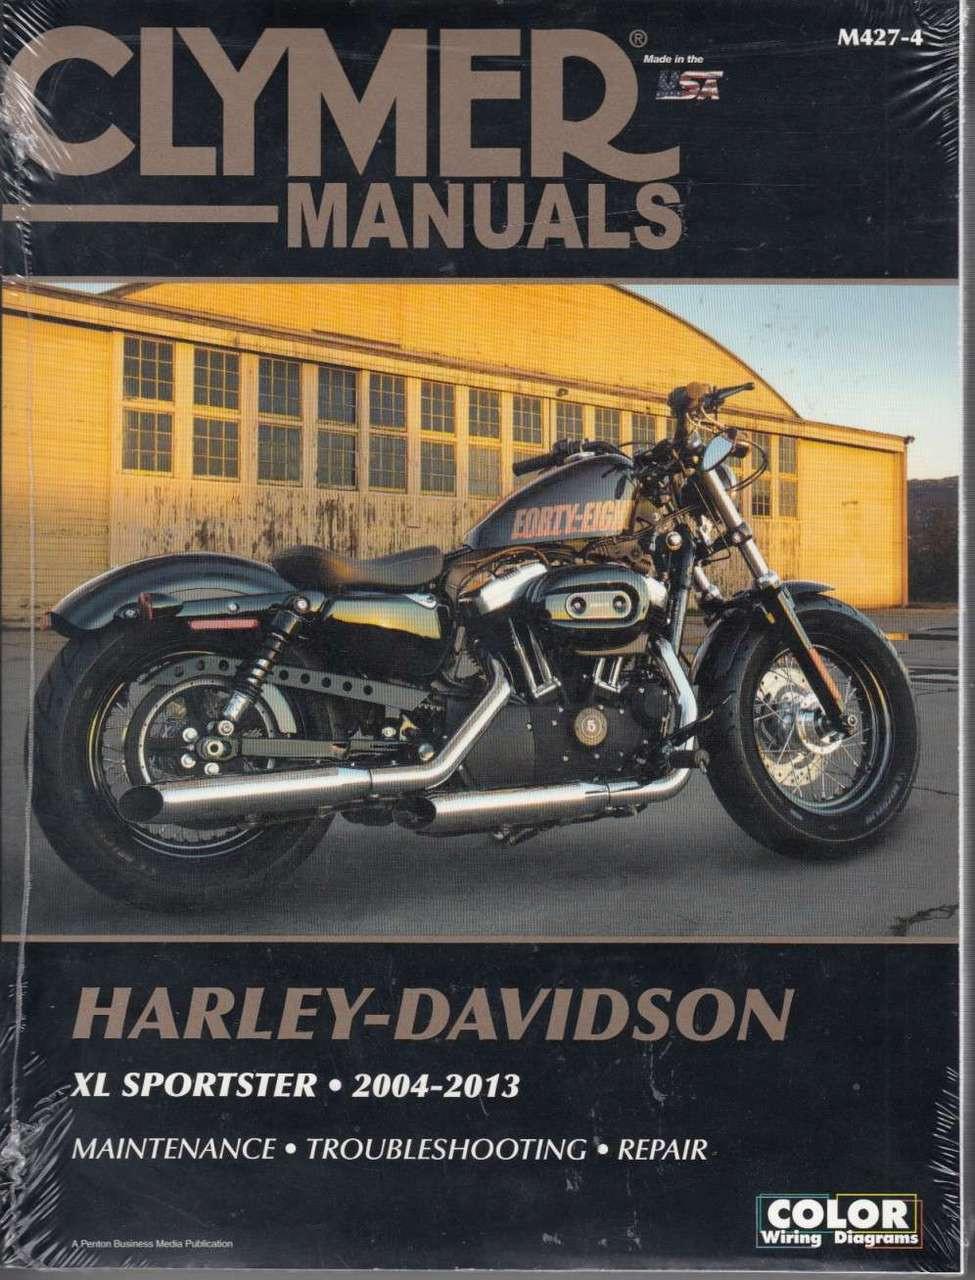 2007 sportster 883 service manual